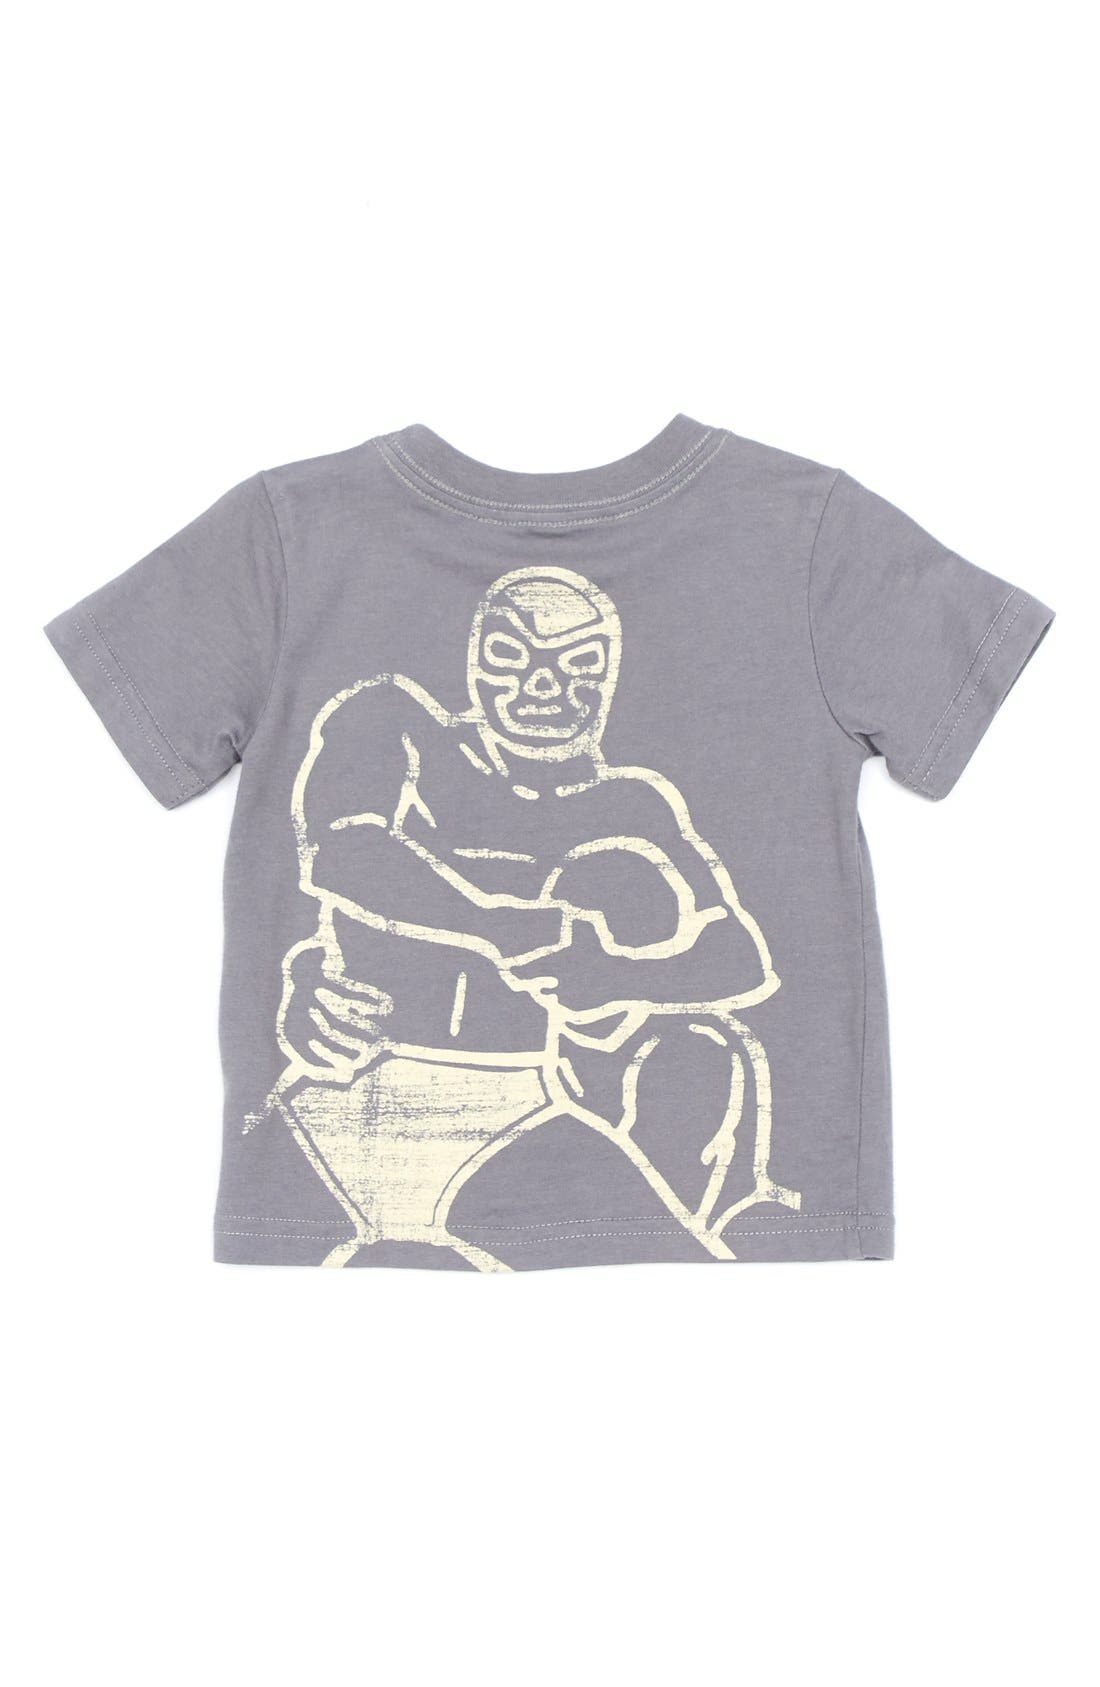 Alternate Image 2  - Peek 'Wrestling' Cotton T-Shirt (Baby Boys)